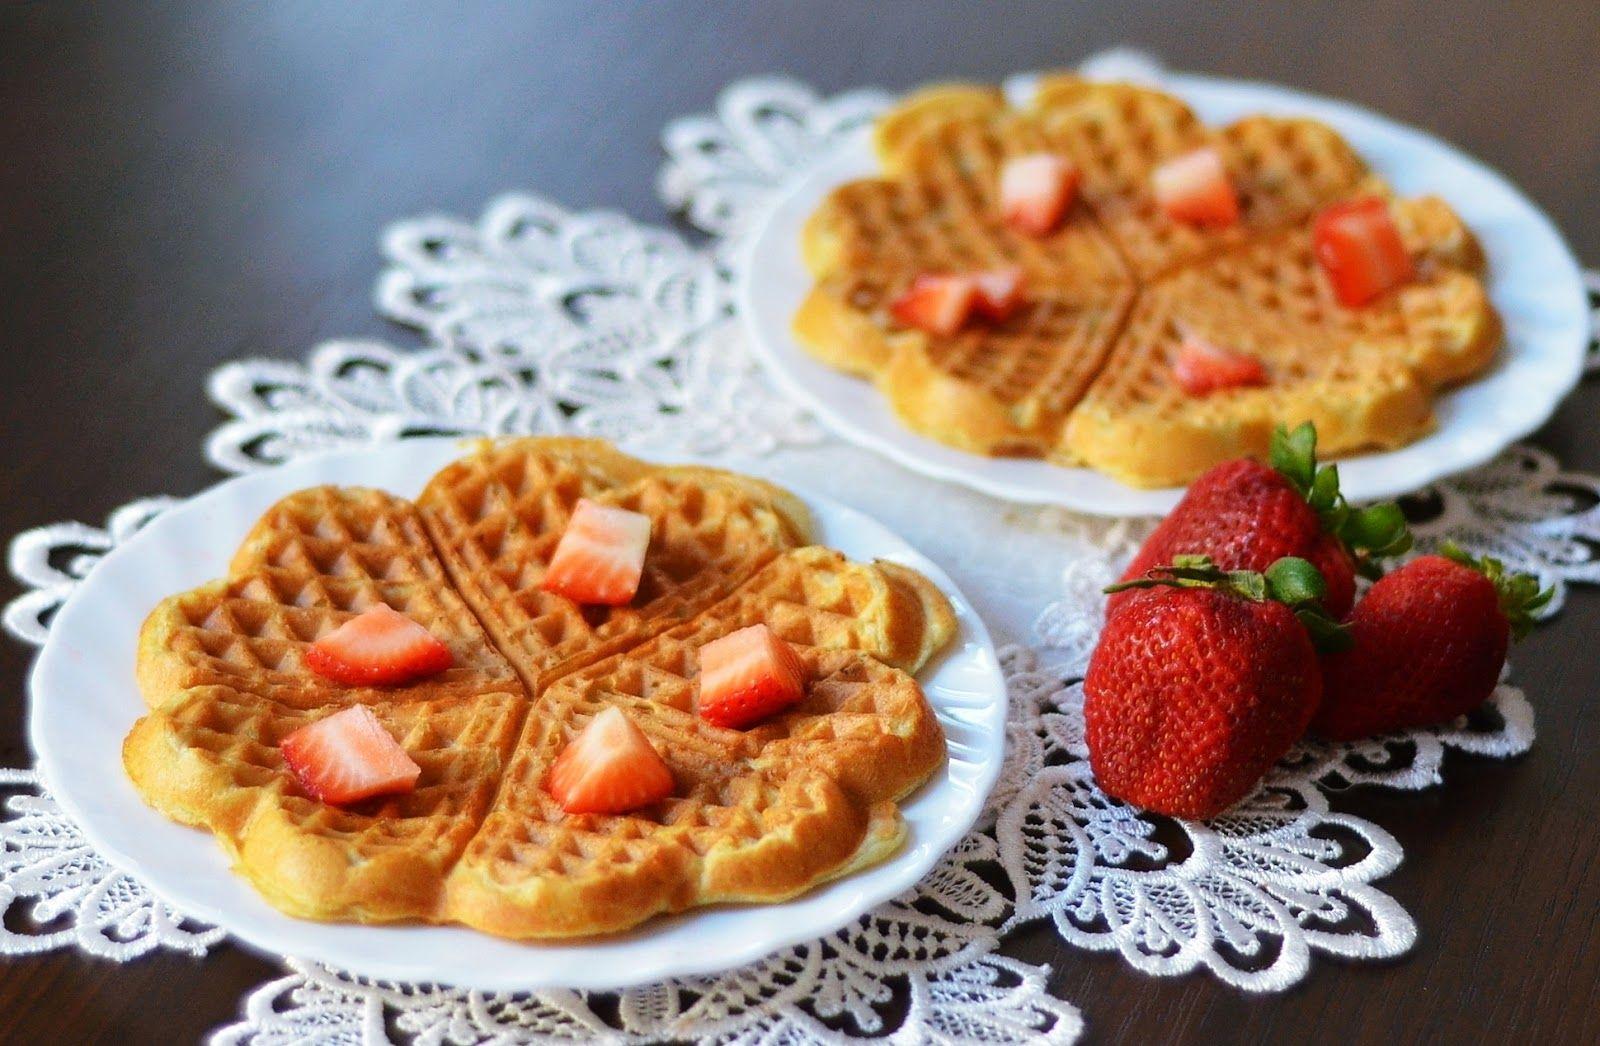 Healthy and delicious vegan coconut milk waffles at